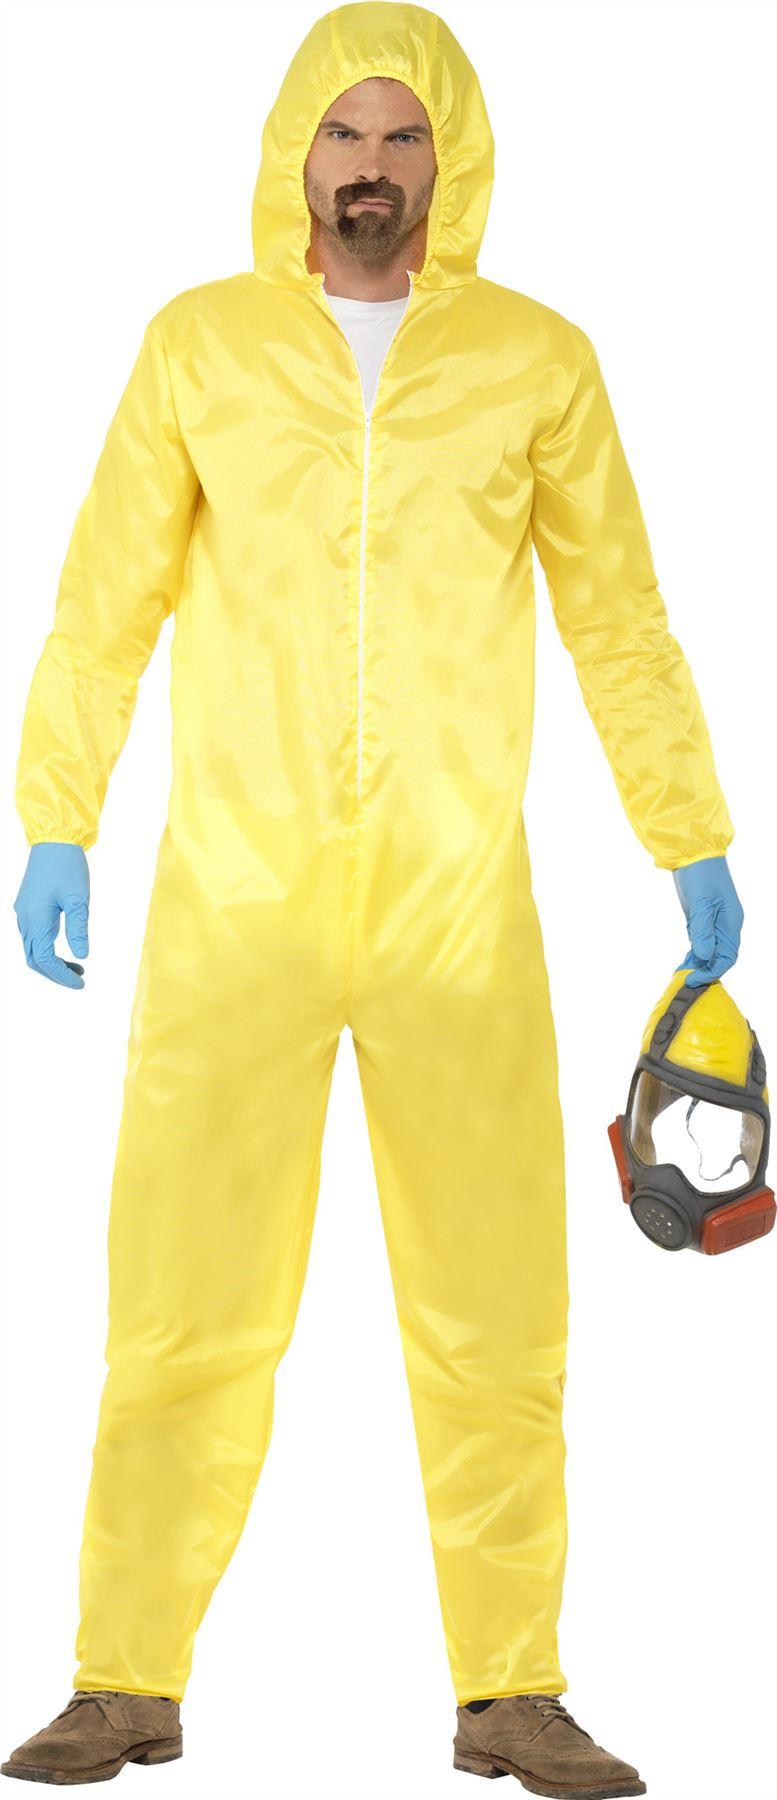 Yellow chemical suit fancy dress